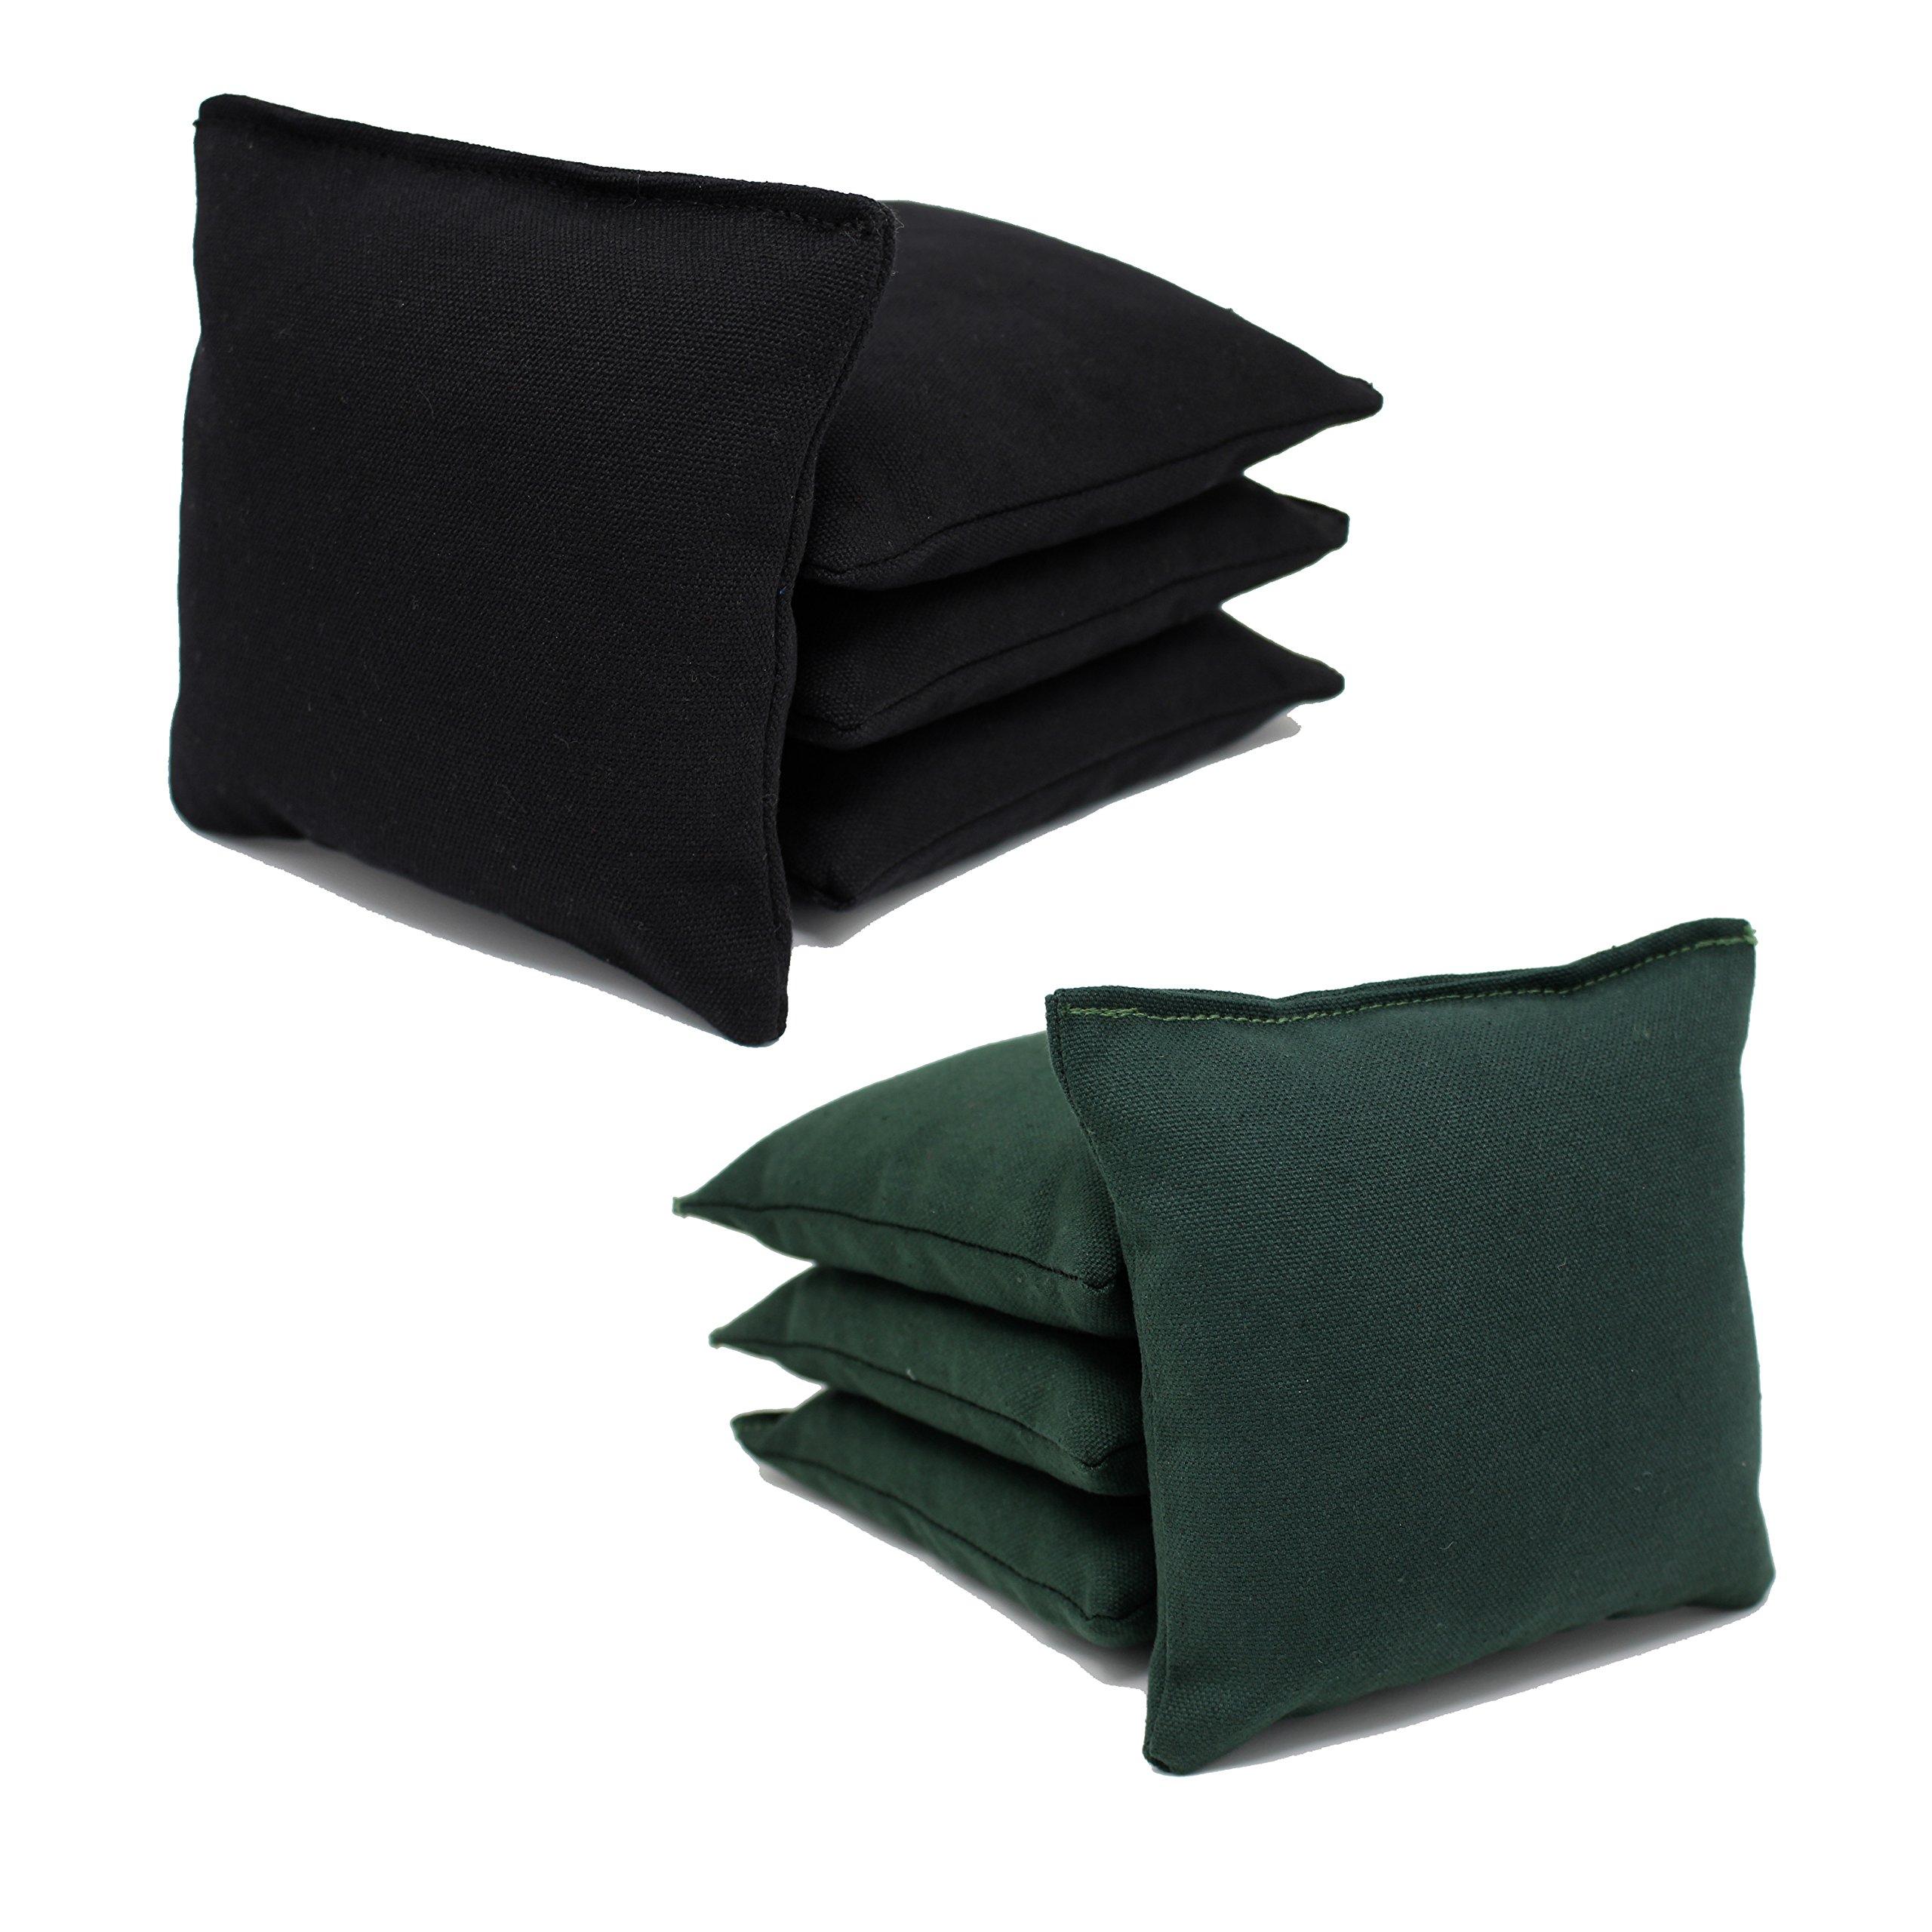 Cornhole Bags Set - (4 Hunter Green, 4 Black) By Free Donkey Sports